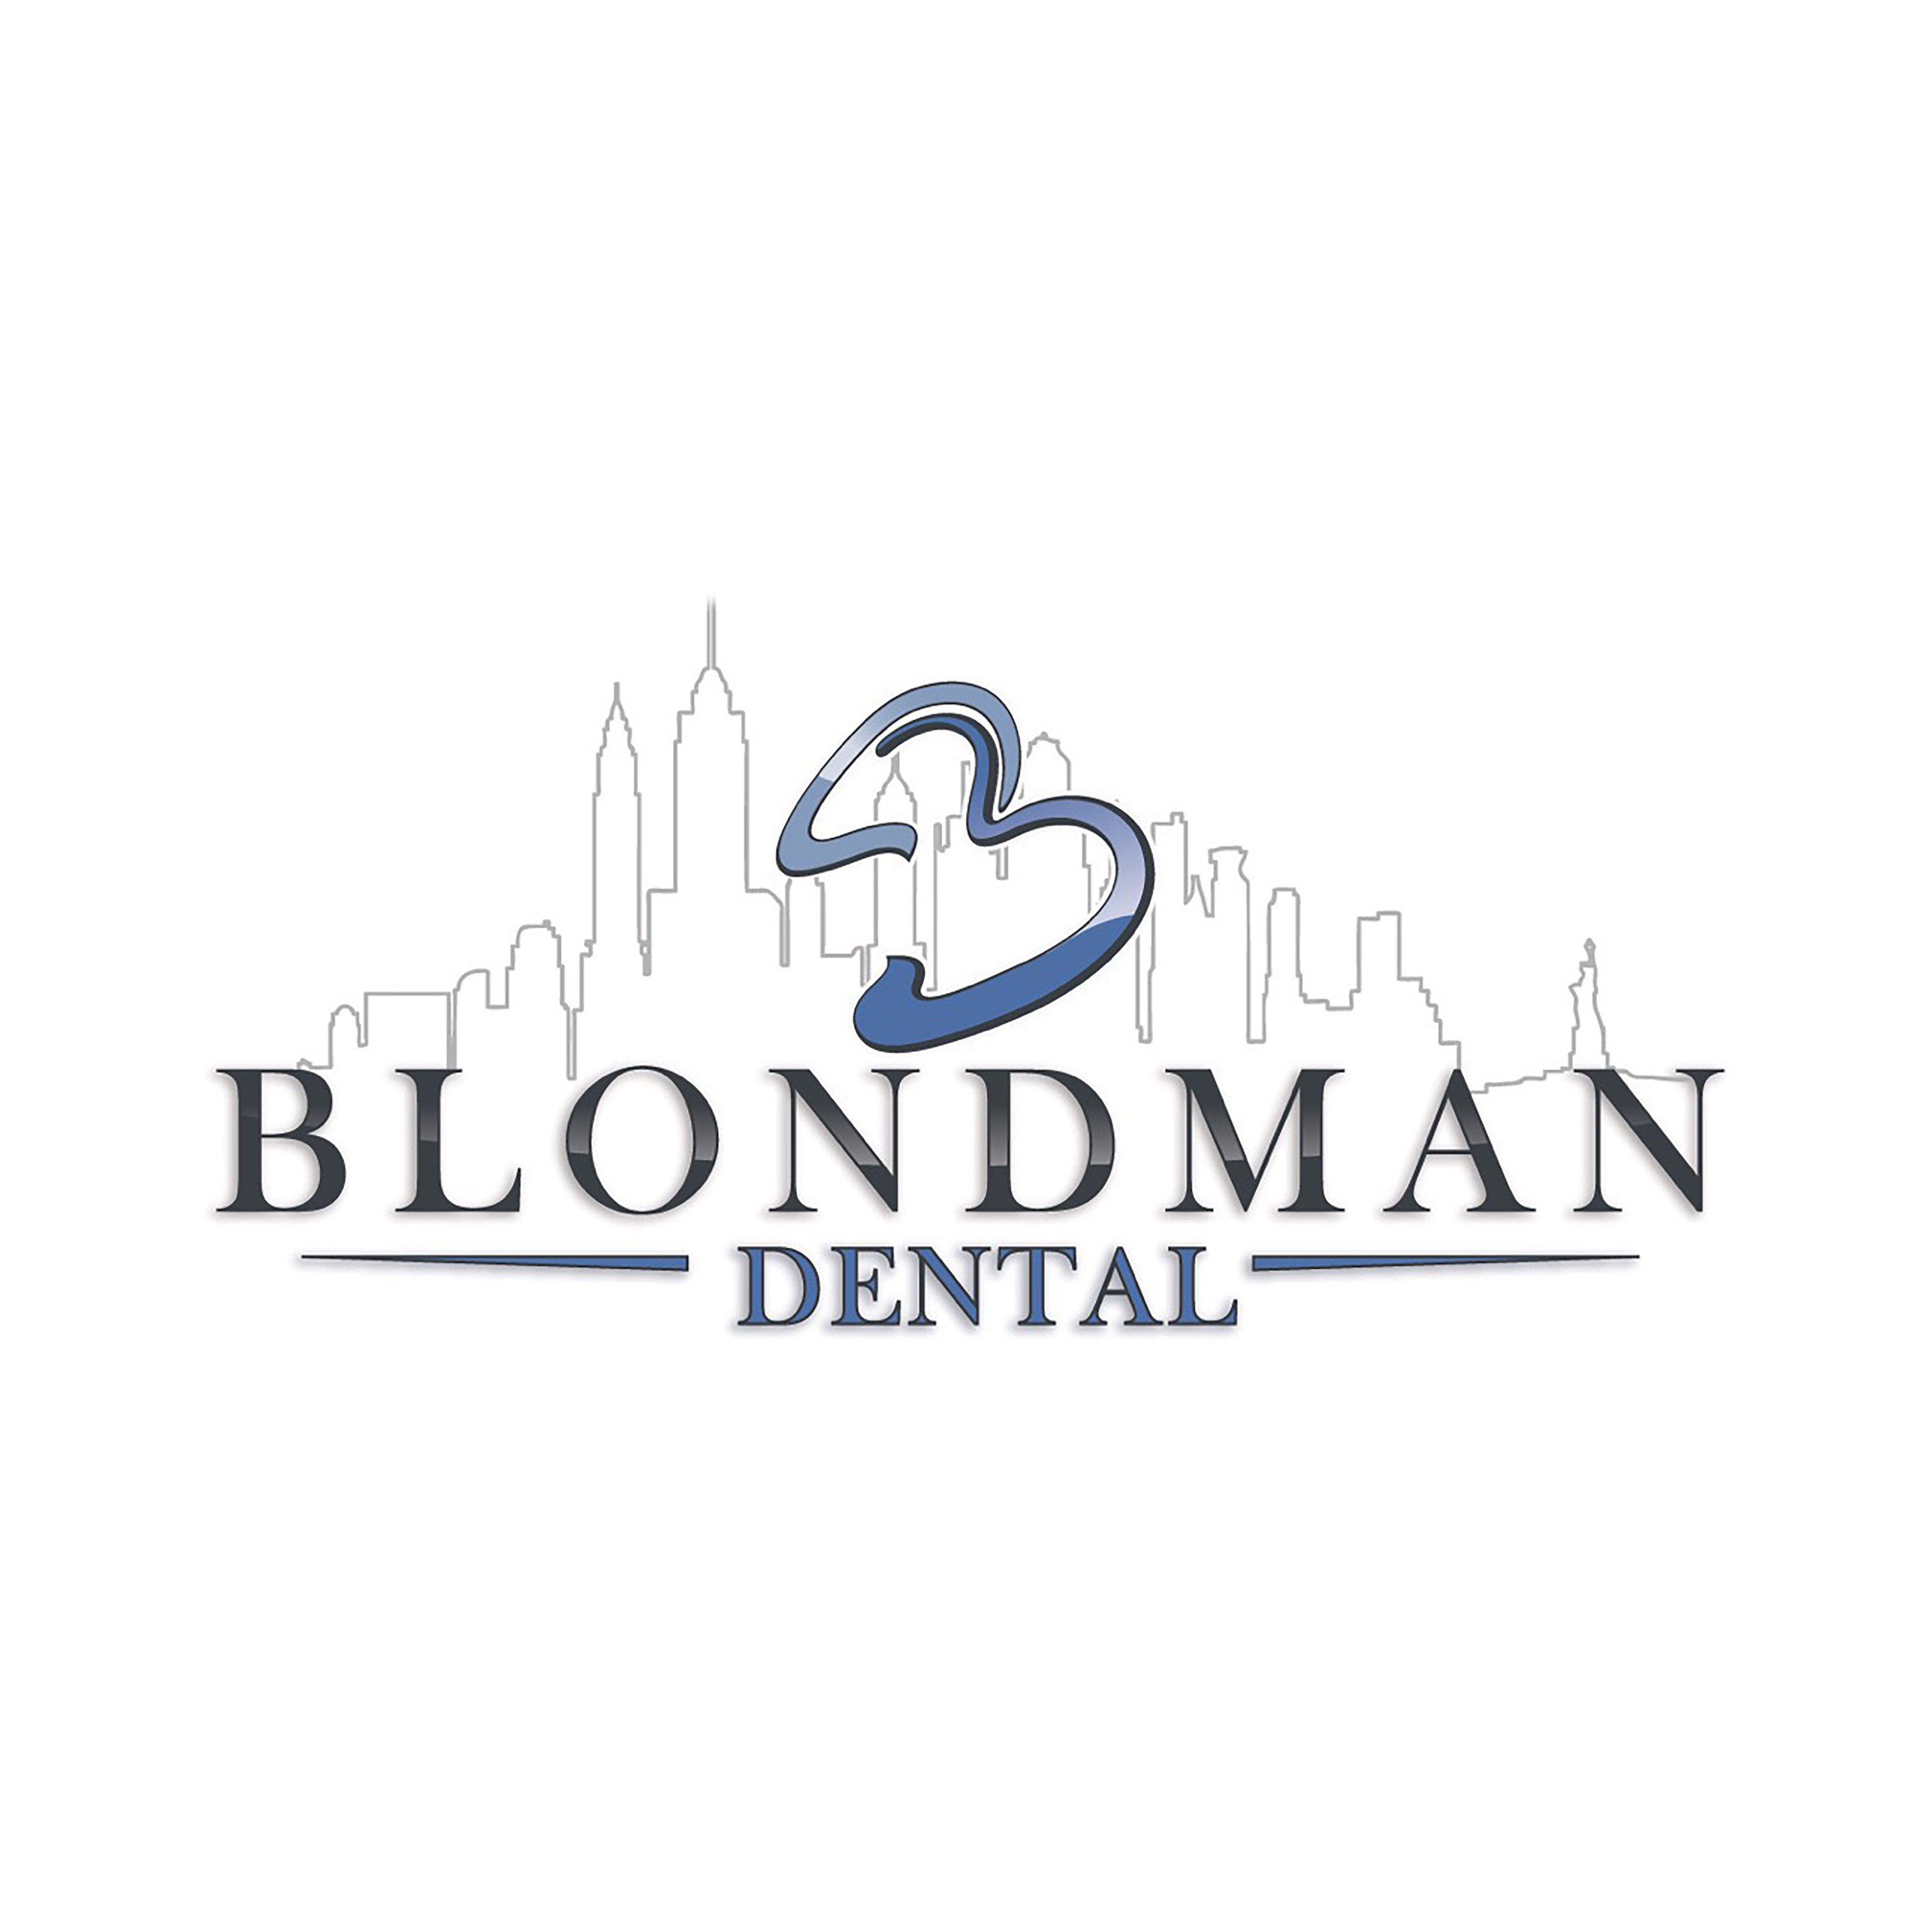 Blondman Dental